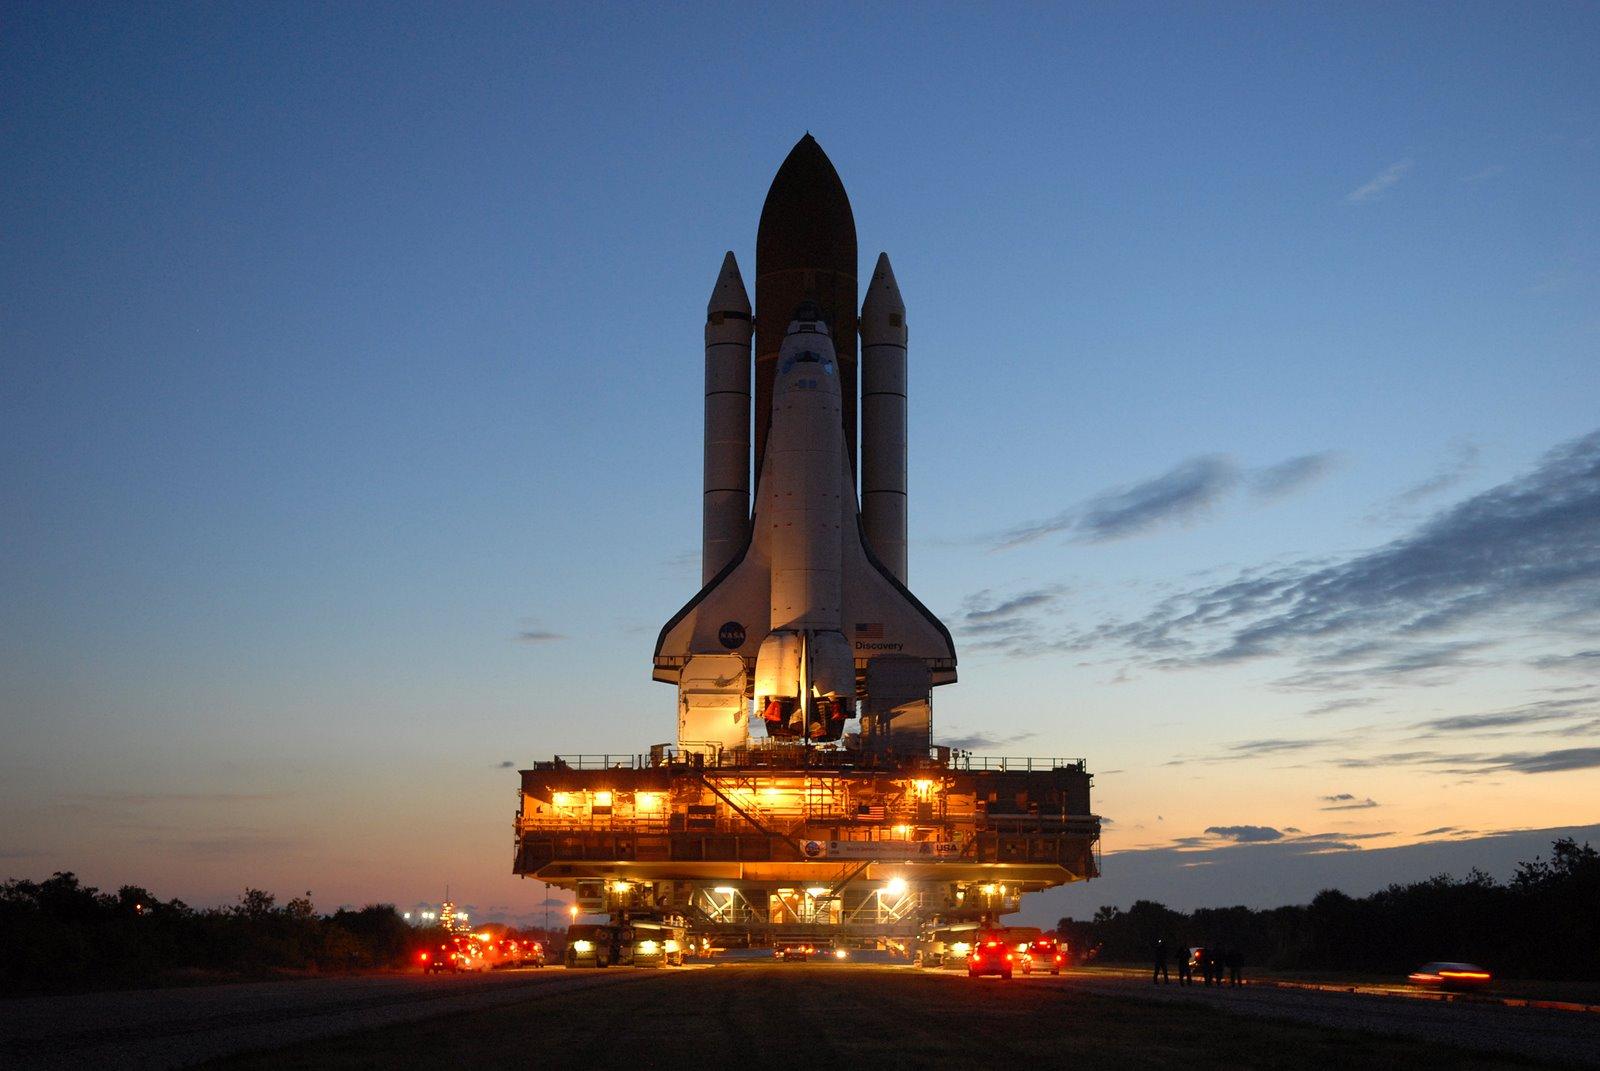 http://4.bp.blogspot.com/-6XLYbhePeQY/TungnjIBqBI/AAAAAAAAHFc/cR5JEO_BszQ/s1600/discovery_space_shuttle.jpg